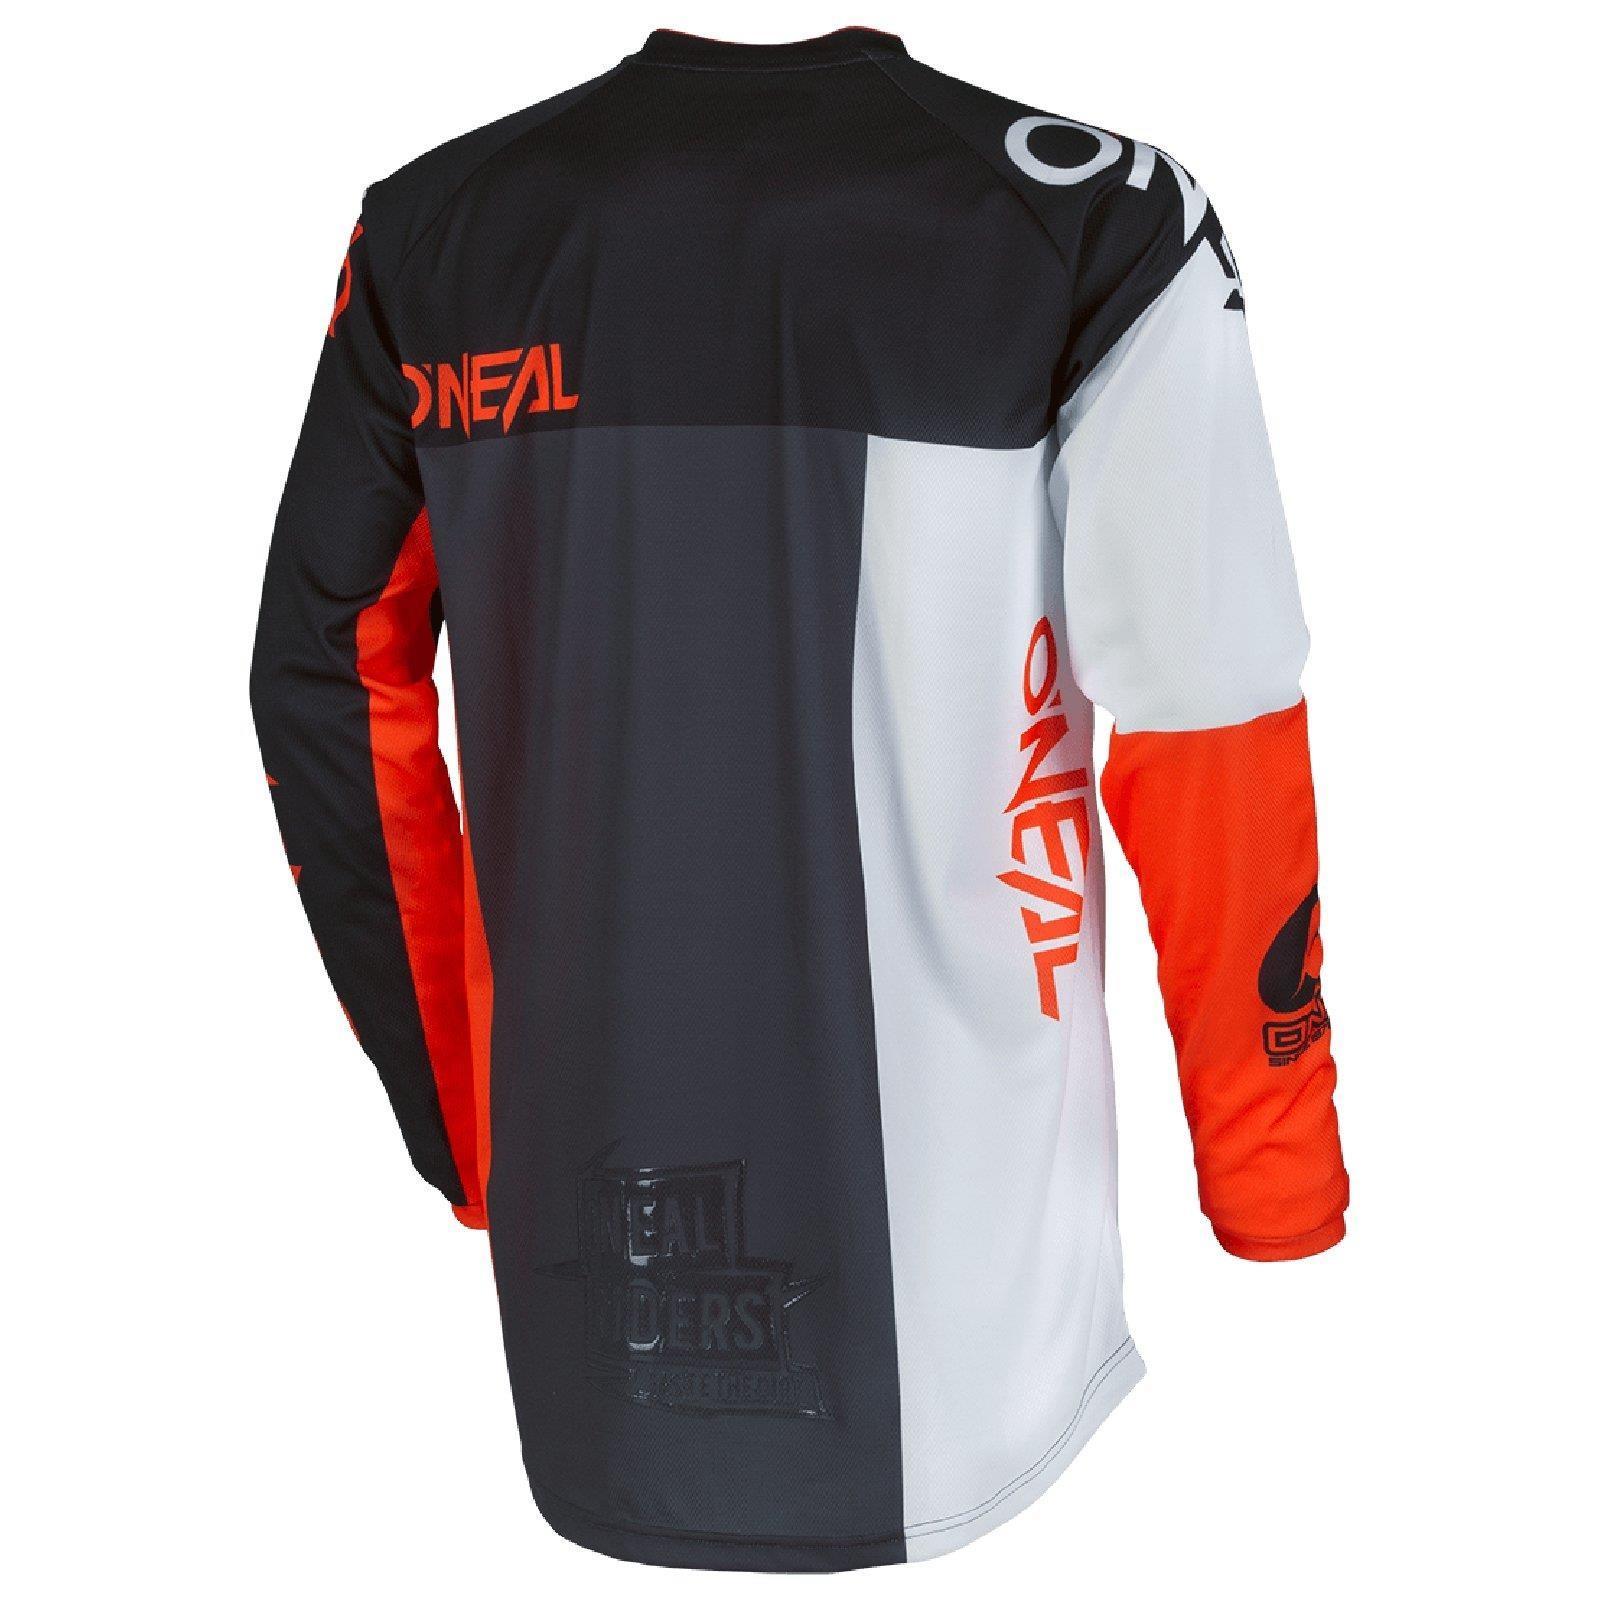 O-039-Neal-elemento-Mayhem-JERSEY-Racewear-Motocross-Maglia-MX-DH-FR-MTB-MOUNTAIN-BIKE miniatura 100